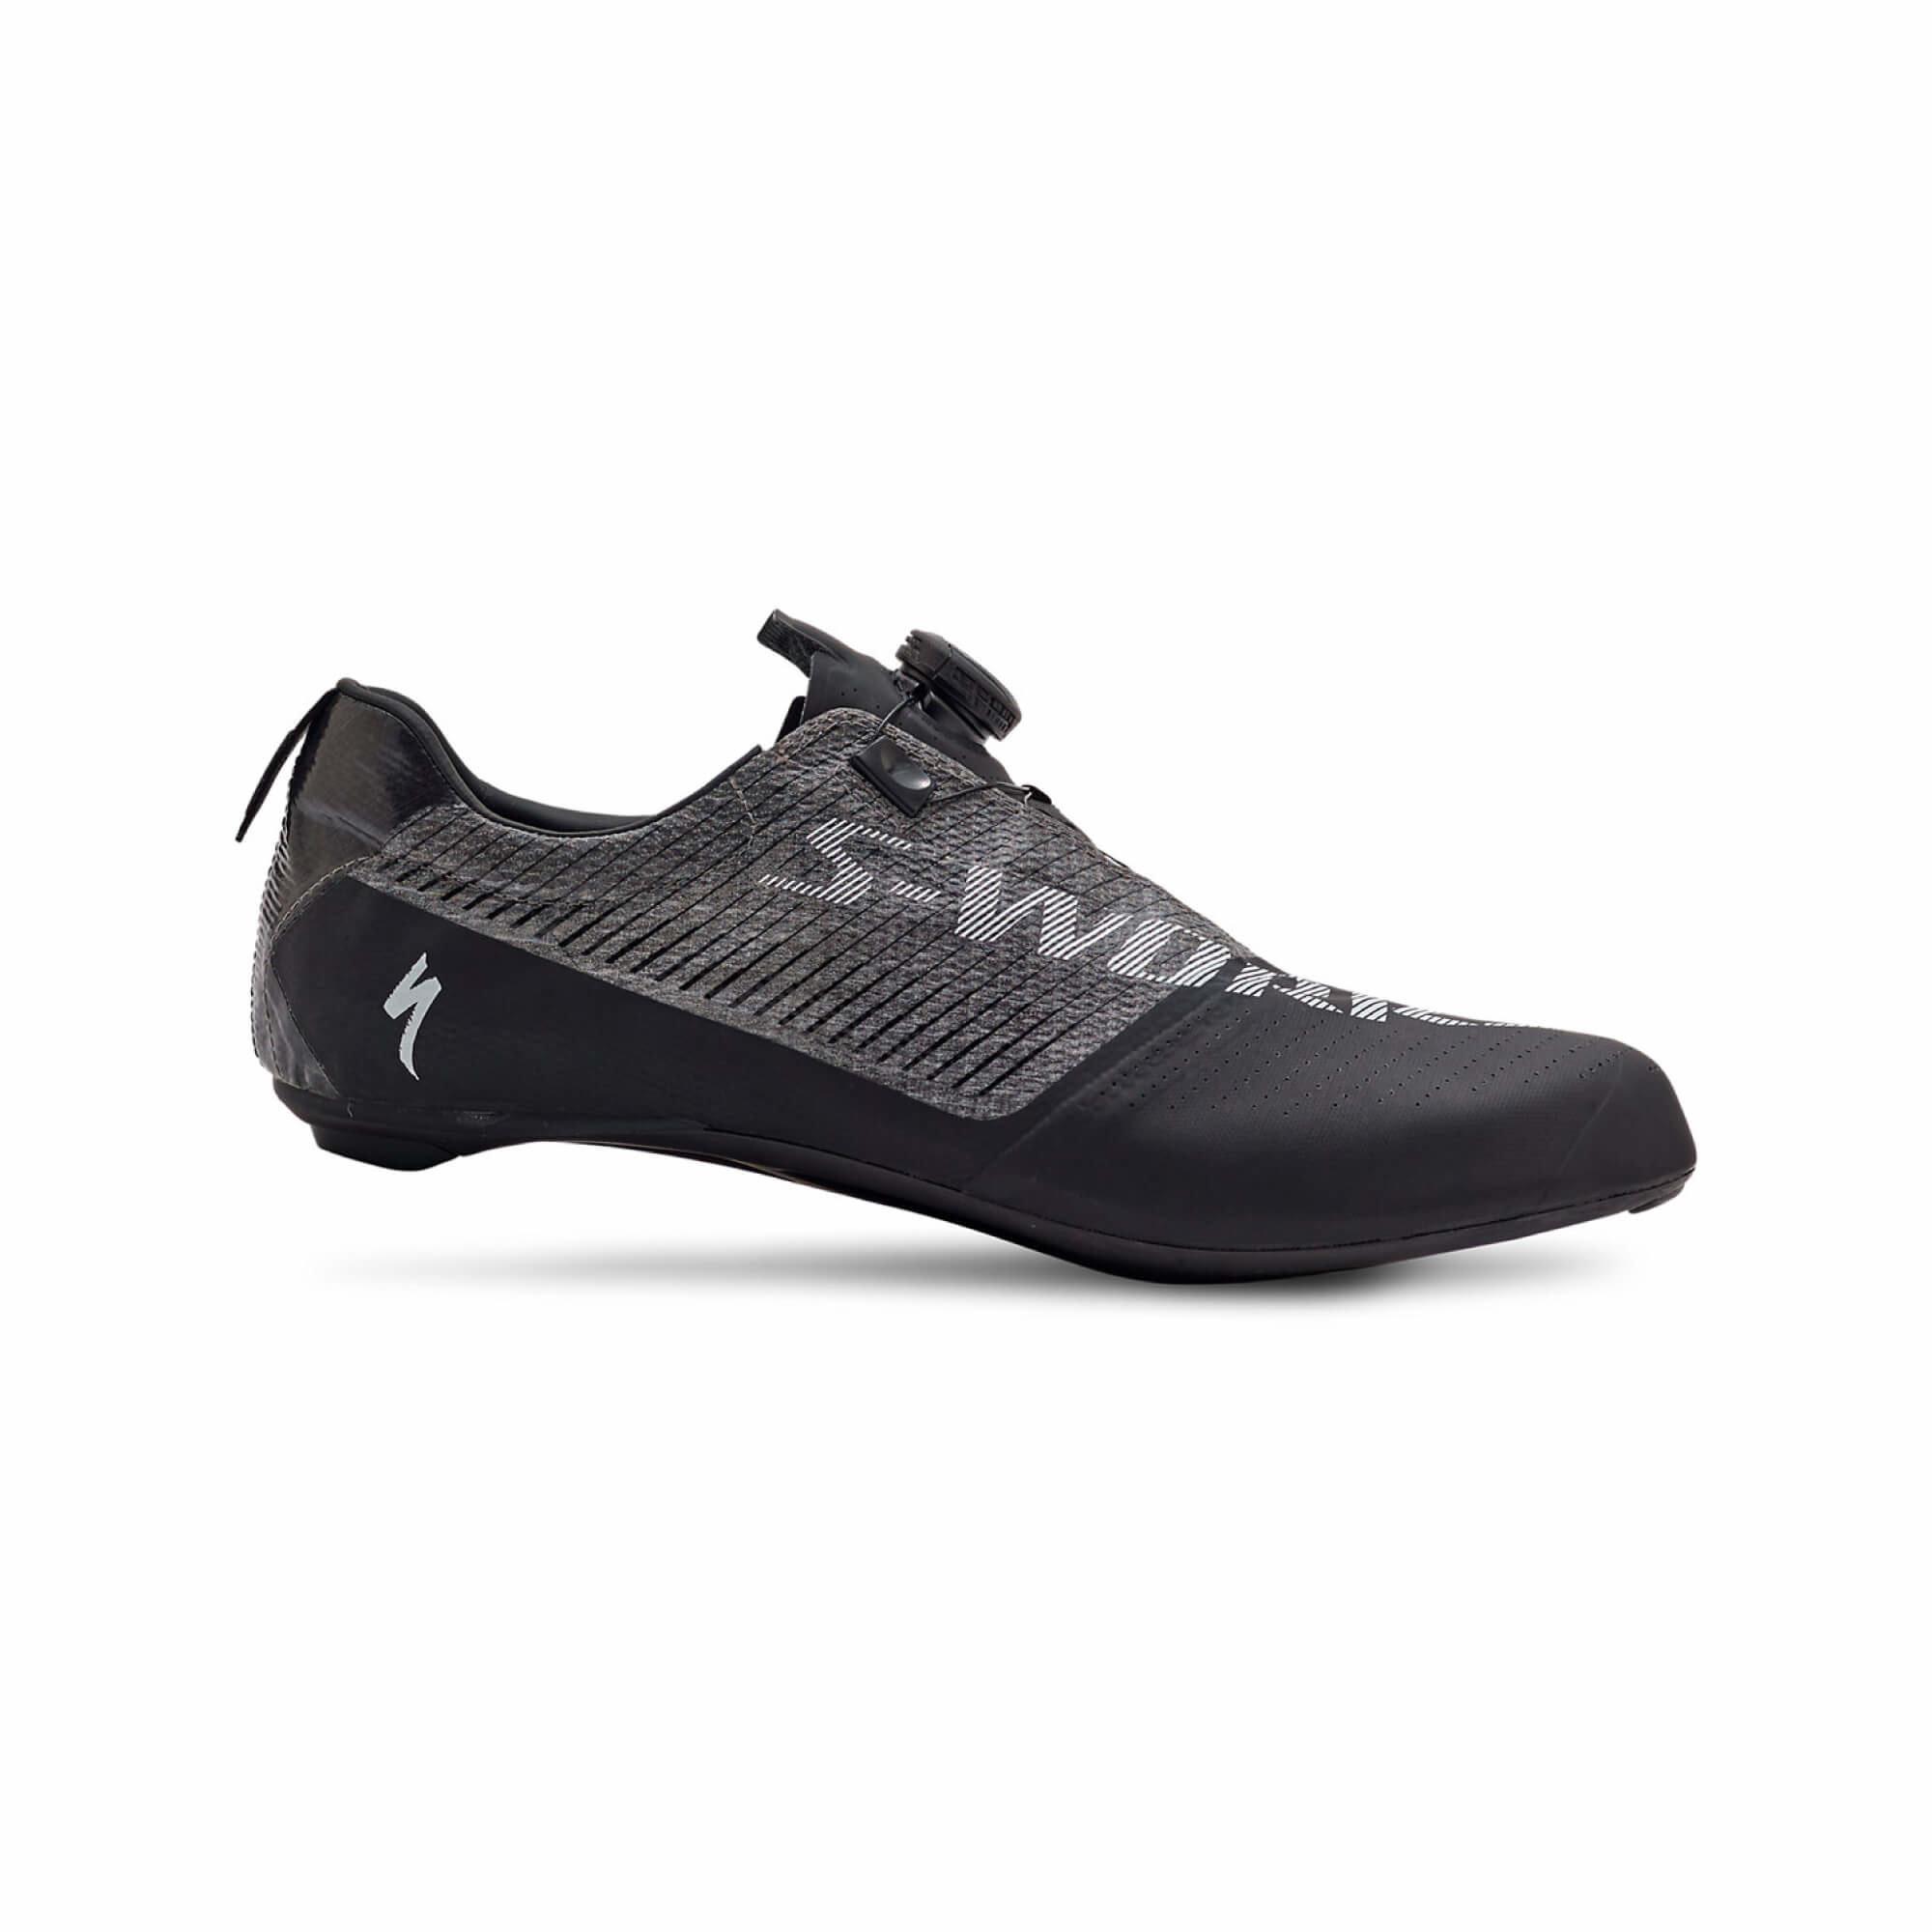 S-Works EXOS Road Shoe-12